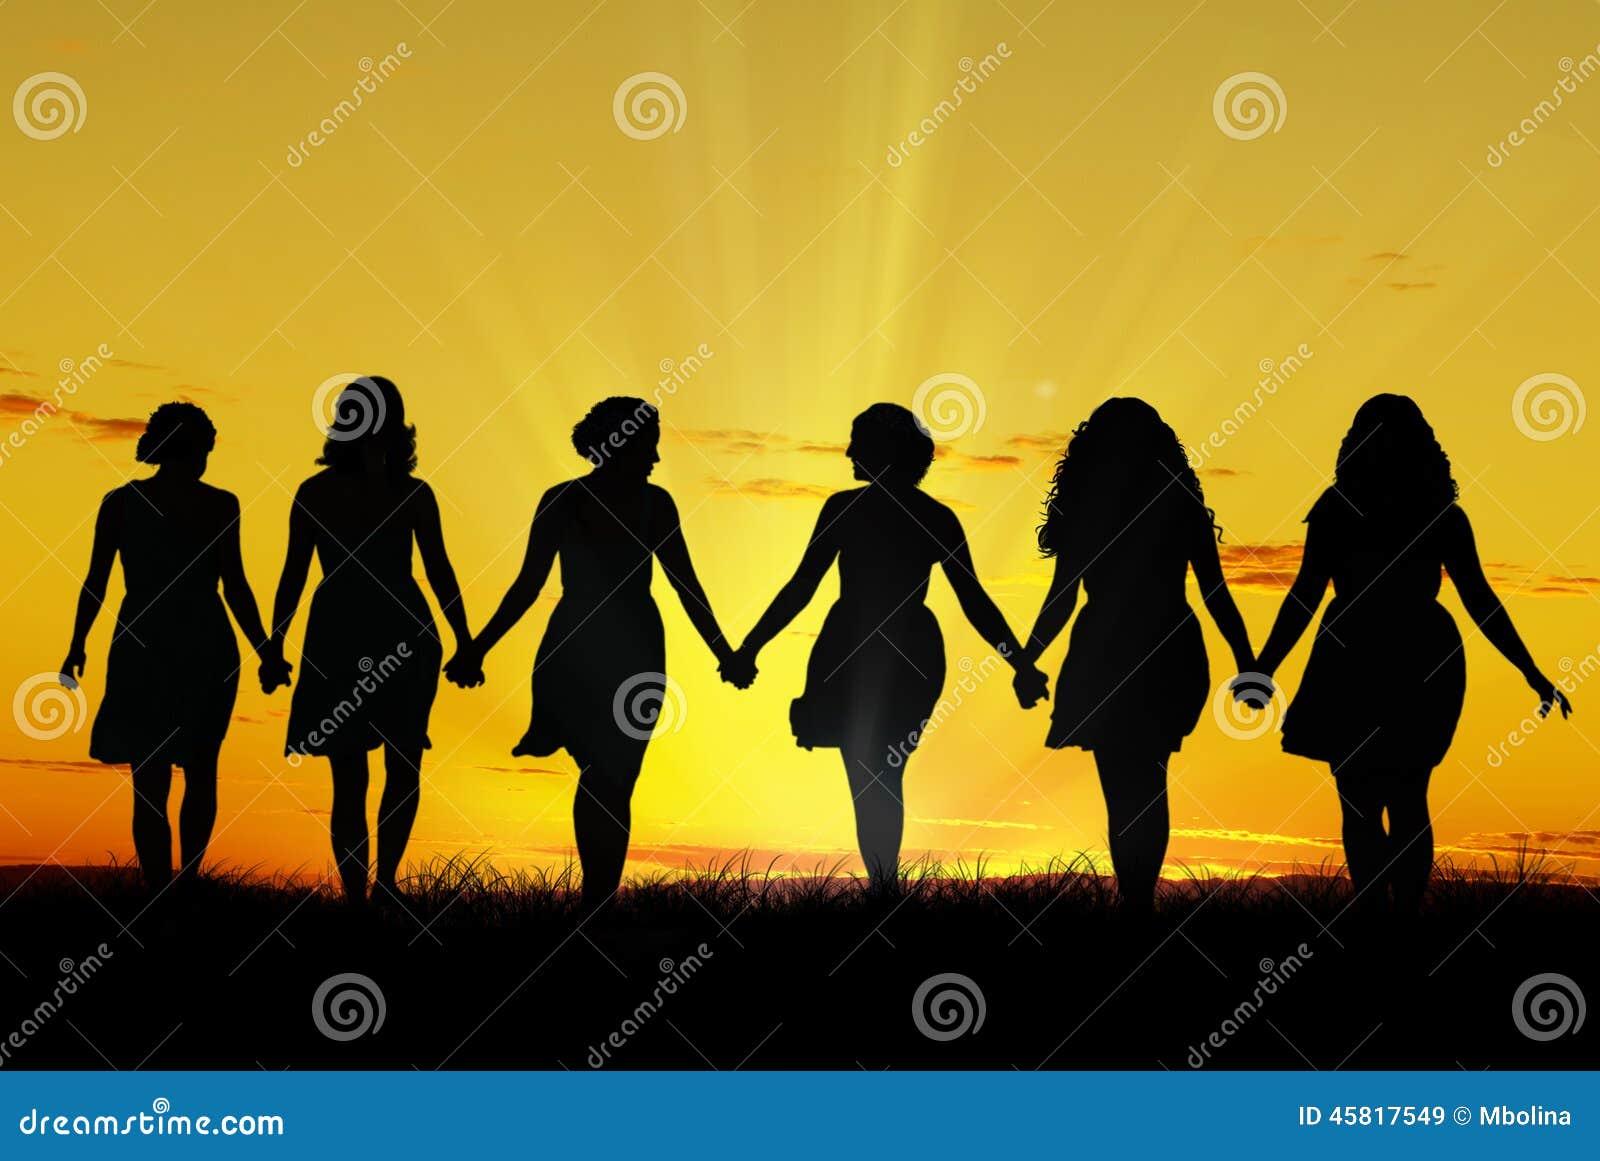 Женщины идя рука об руку